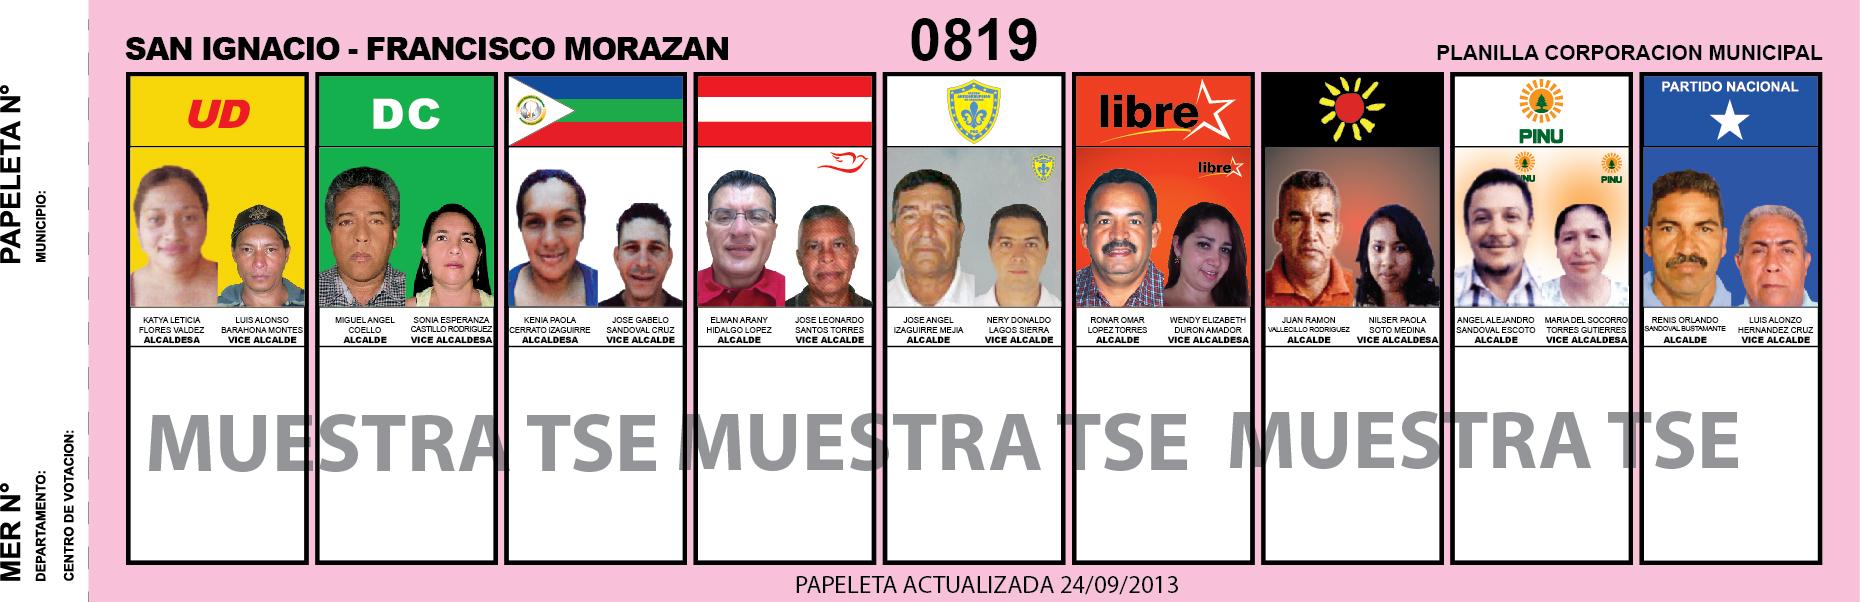 CANDIDATOS 2013 MUNICIPIO SAN IGNACIO - FRANCISCO MORAZAN - HONDURAS